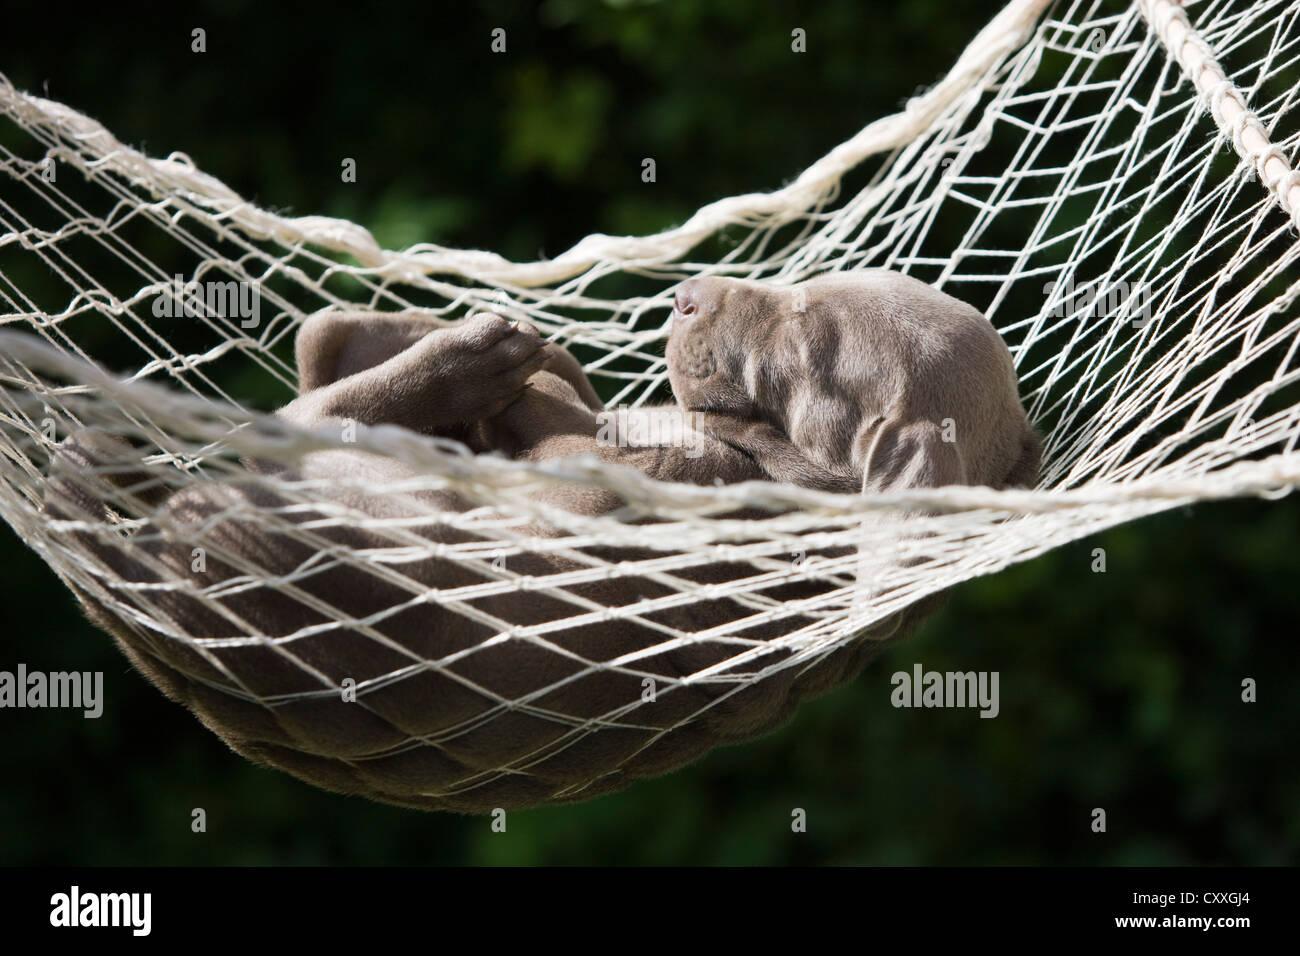 Weimaraner Dog Puppy Sleeping In A Hammock North Tyrol